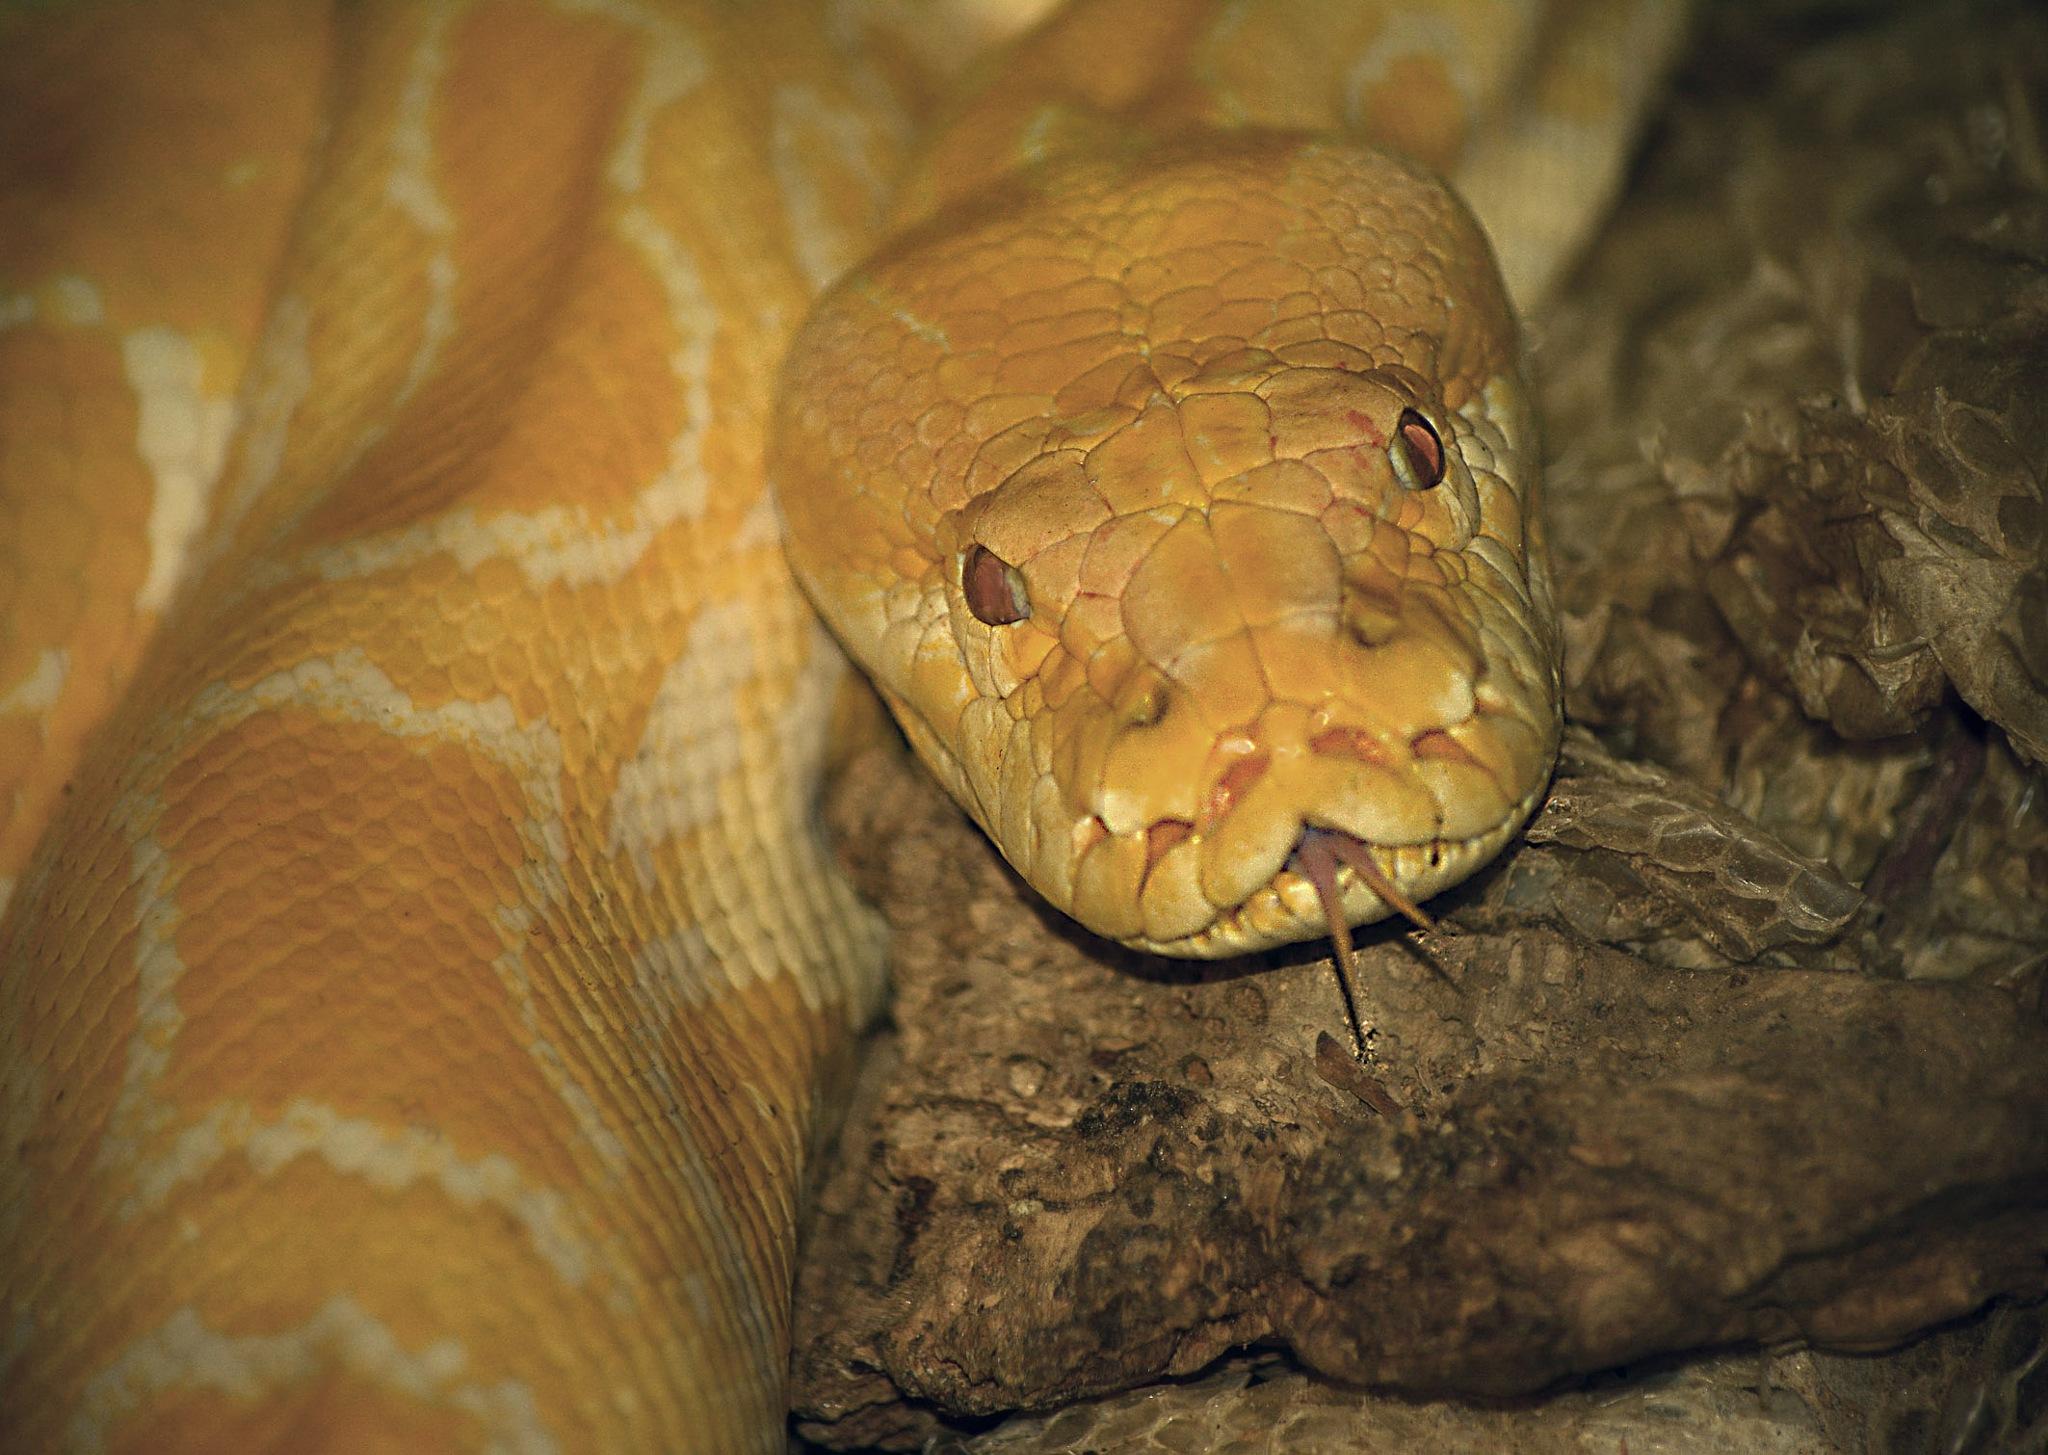 Albino Burmese Python by Mirza Cengic